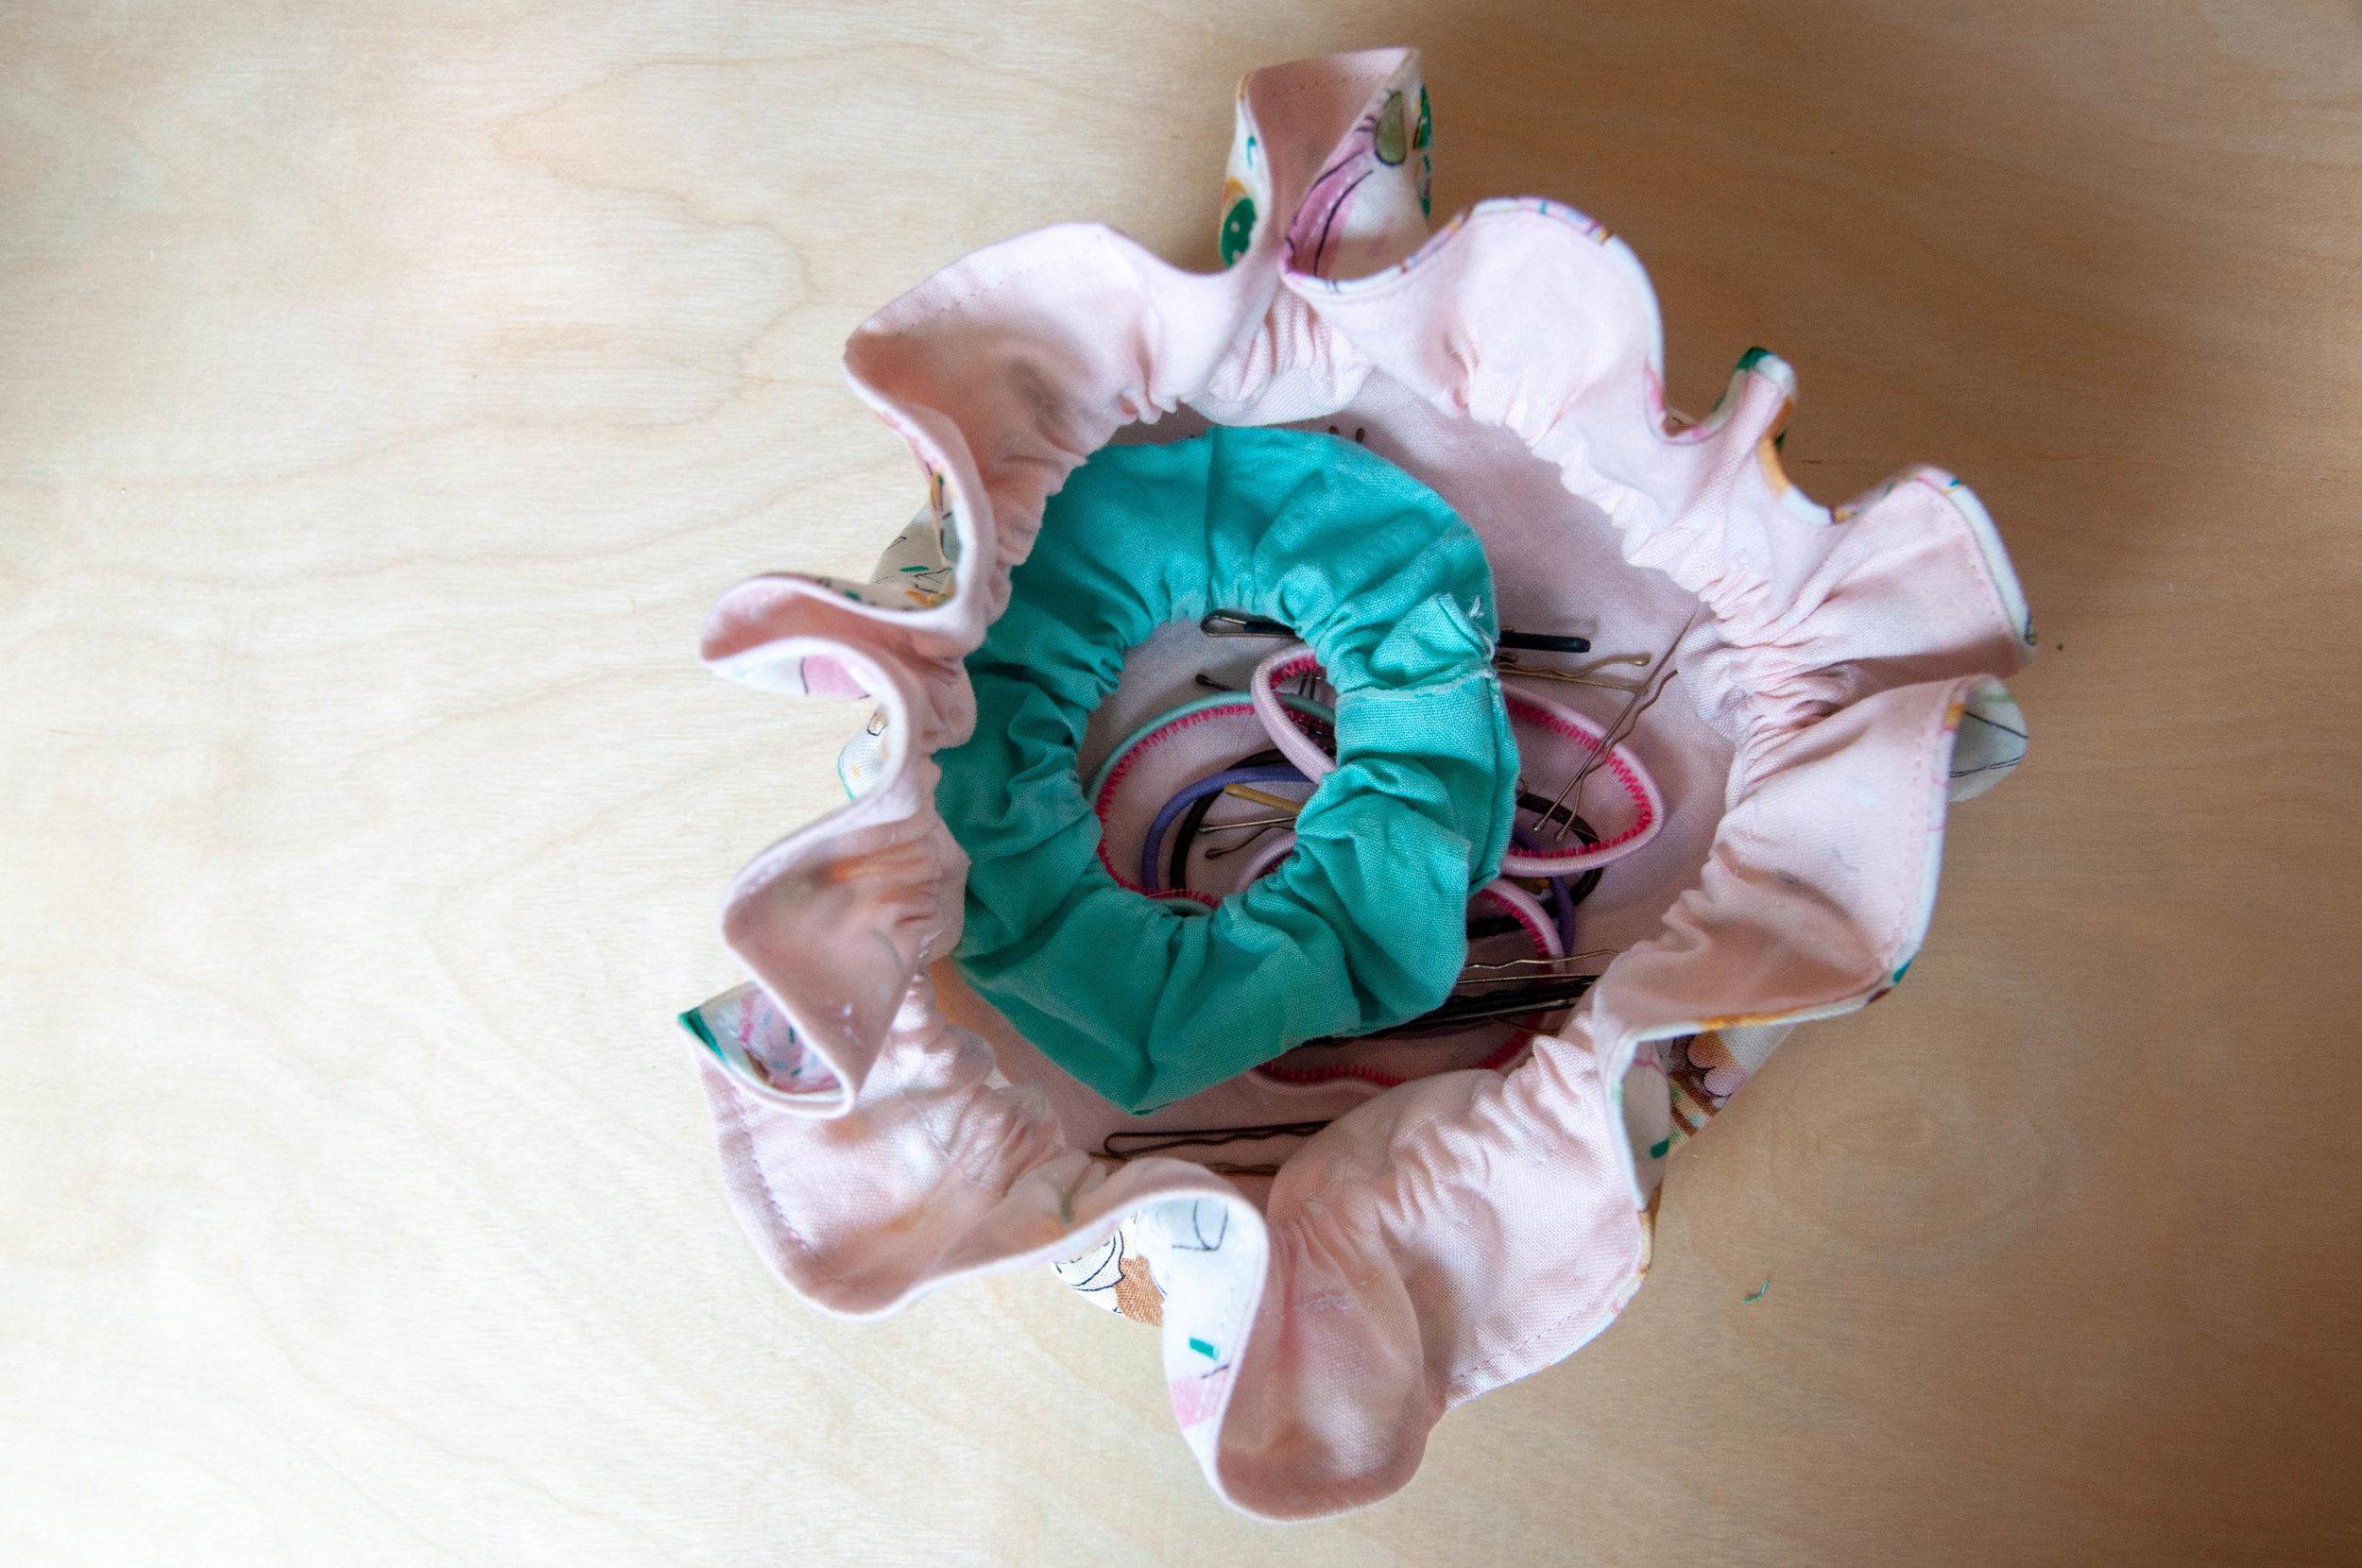 Drawstring bag sewing tutorial by Nikki at PIn, Cut, Sew Studio